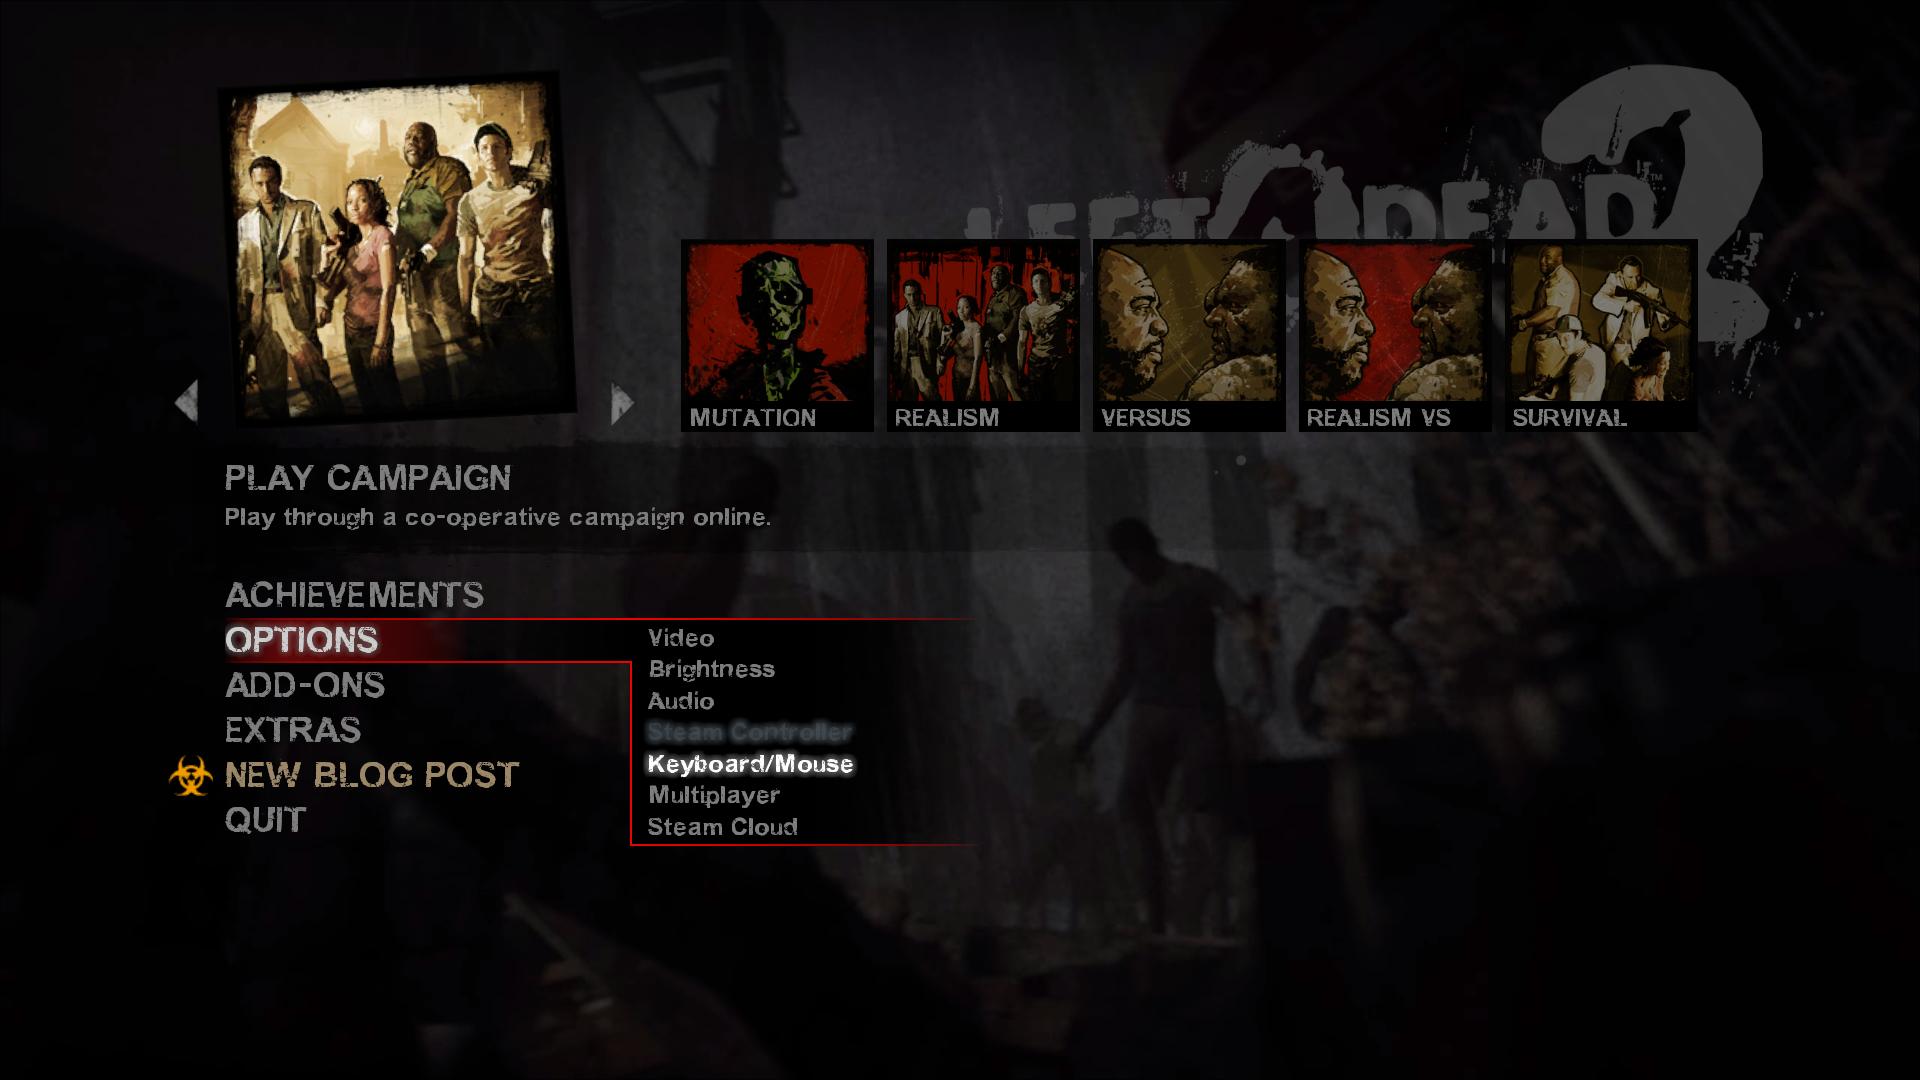 The Left 4 Dead 2's Options menu